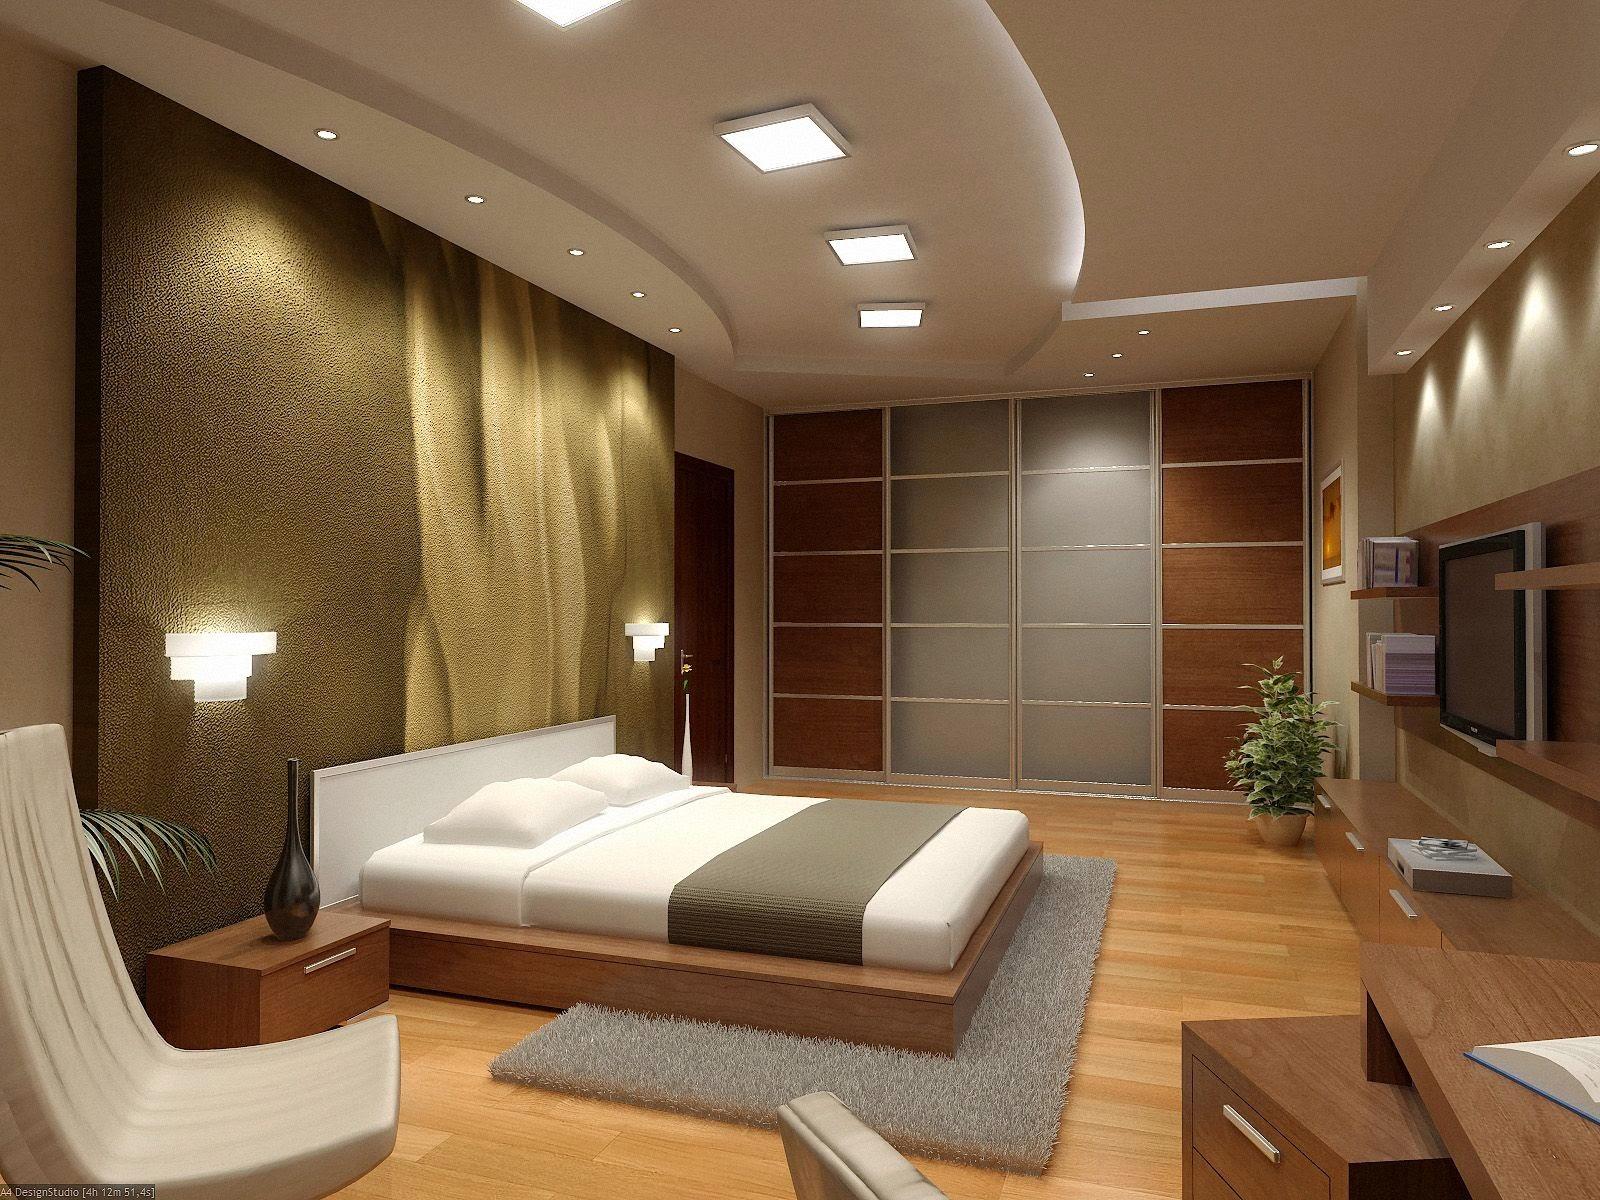 Design interior rumah minimalis modern desain rumah for Design interior modern minimalis